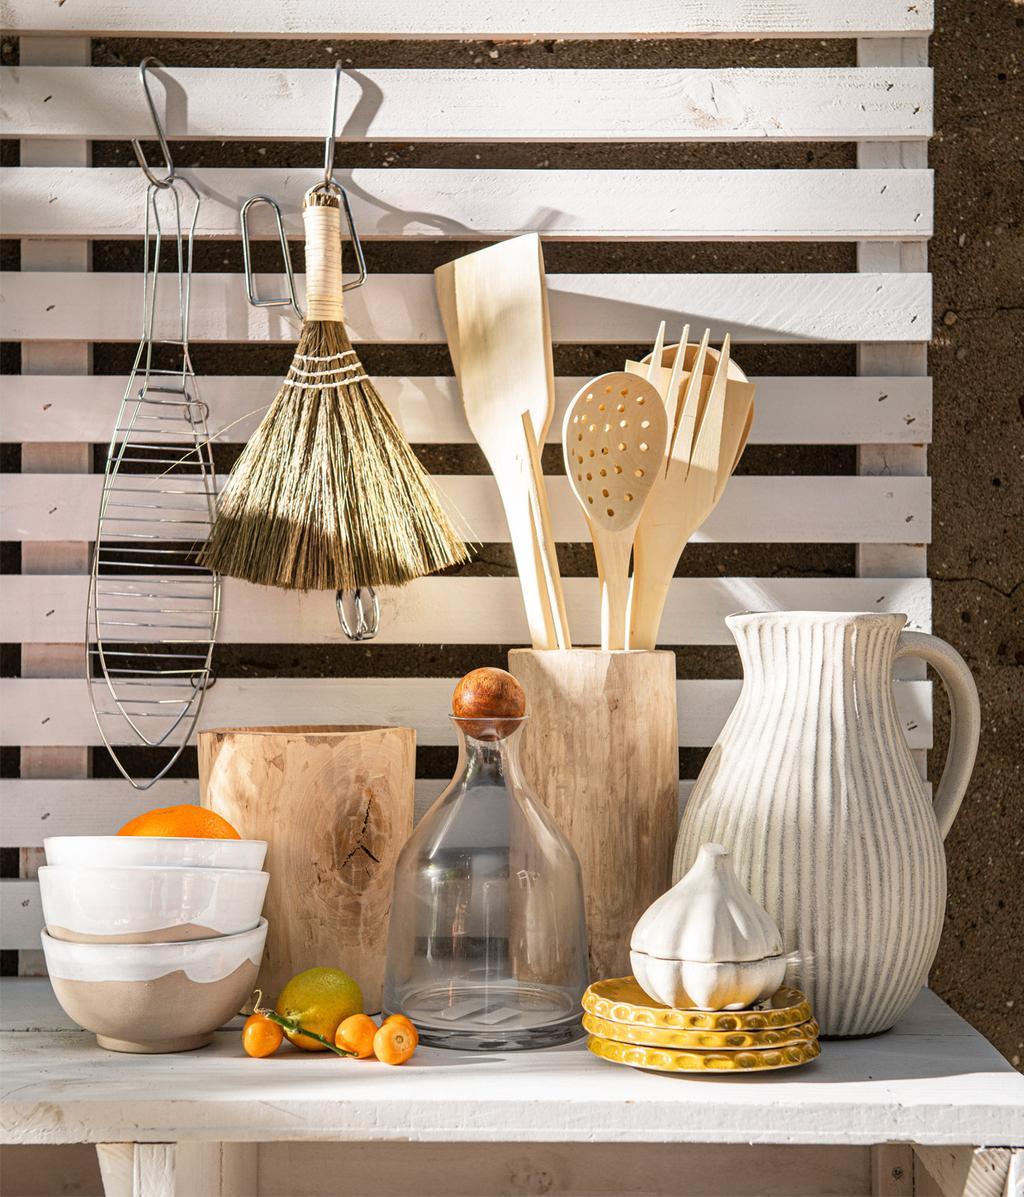 DIY keukenblok | accessoires | vtwonen